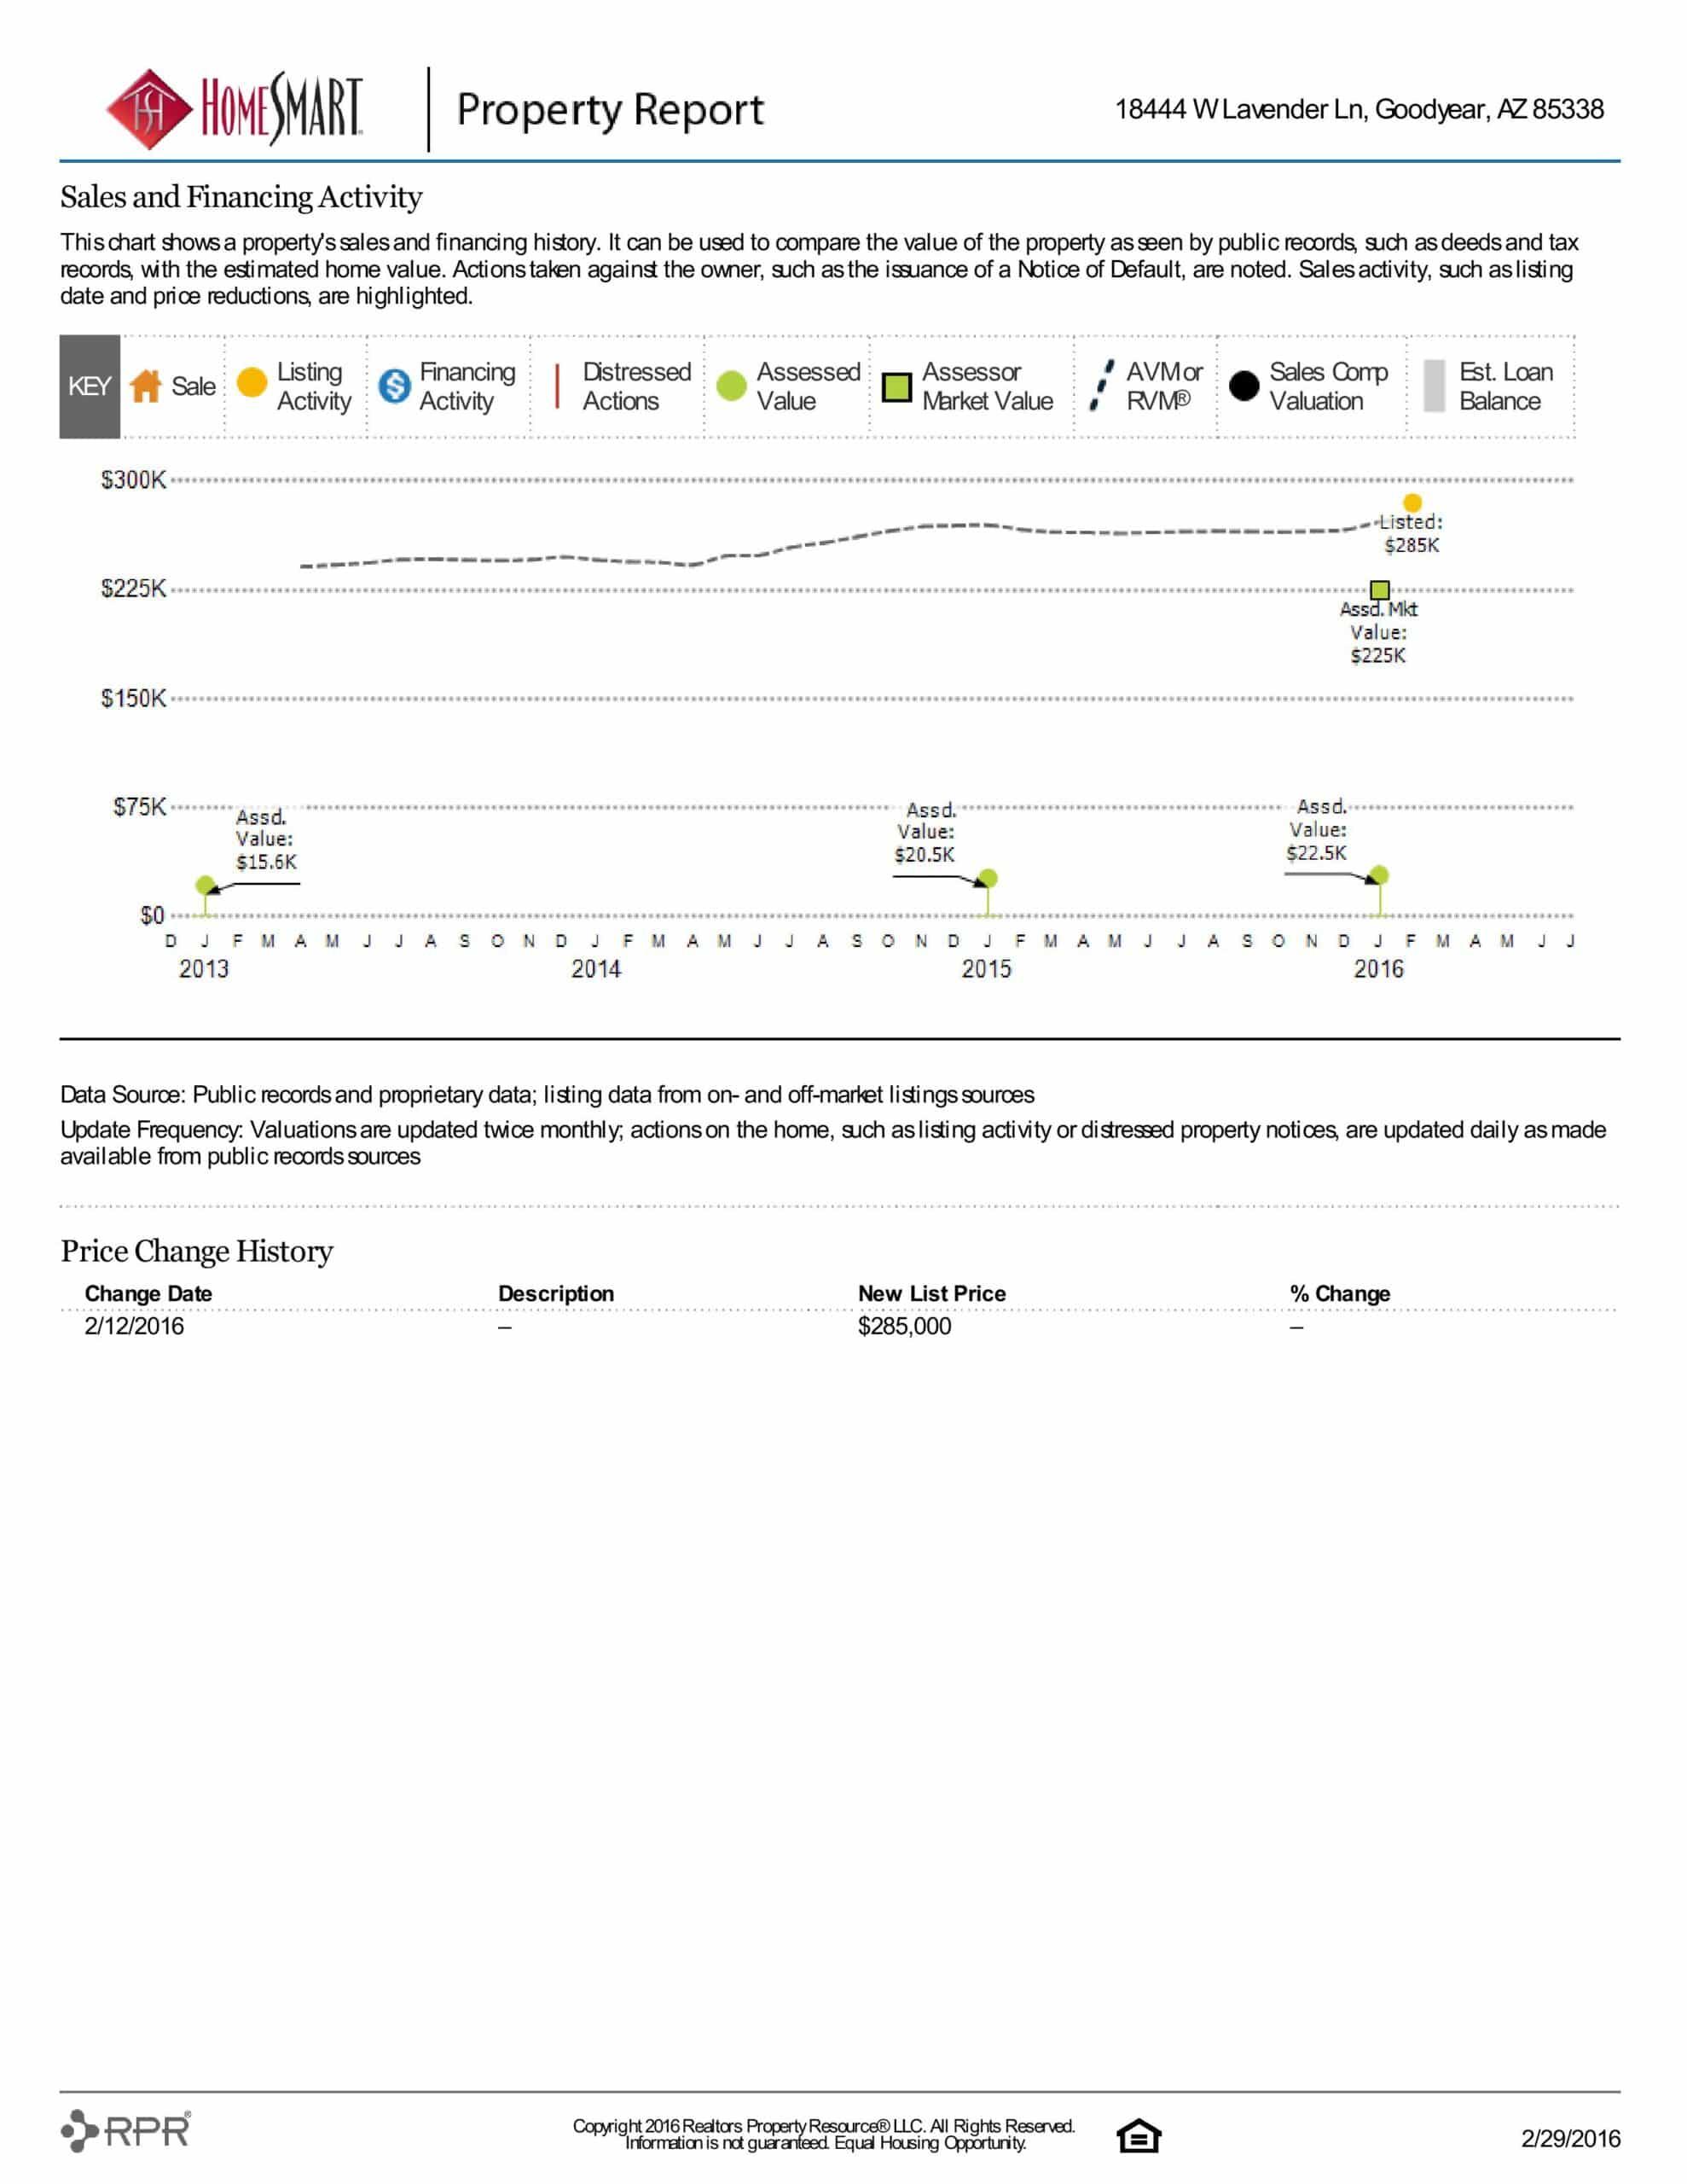 18444 W LAVENDER LN PROPERTY REPORT-page-012